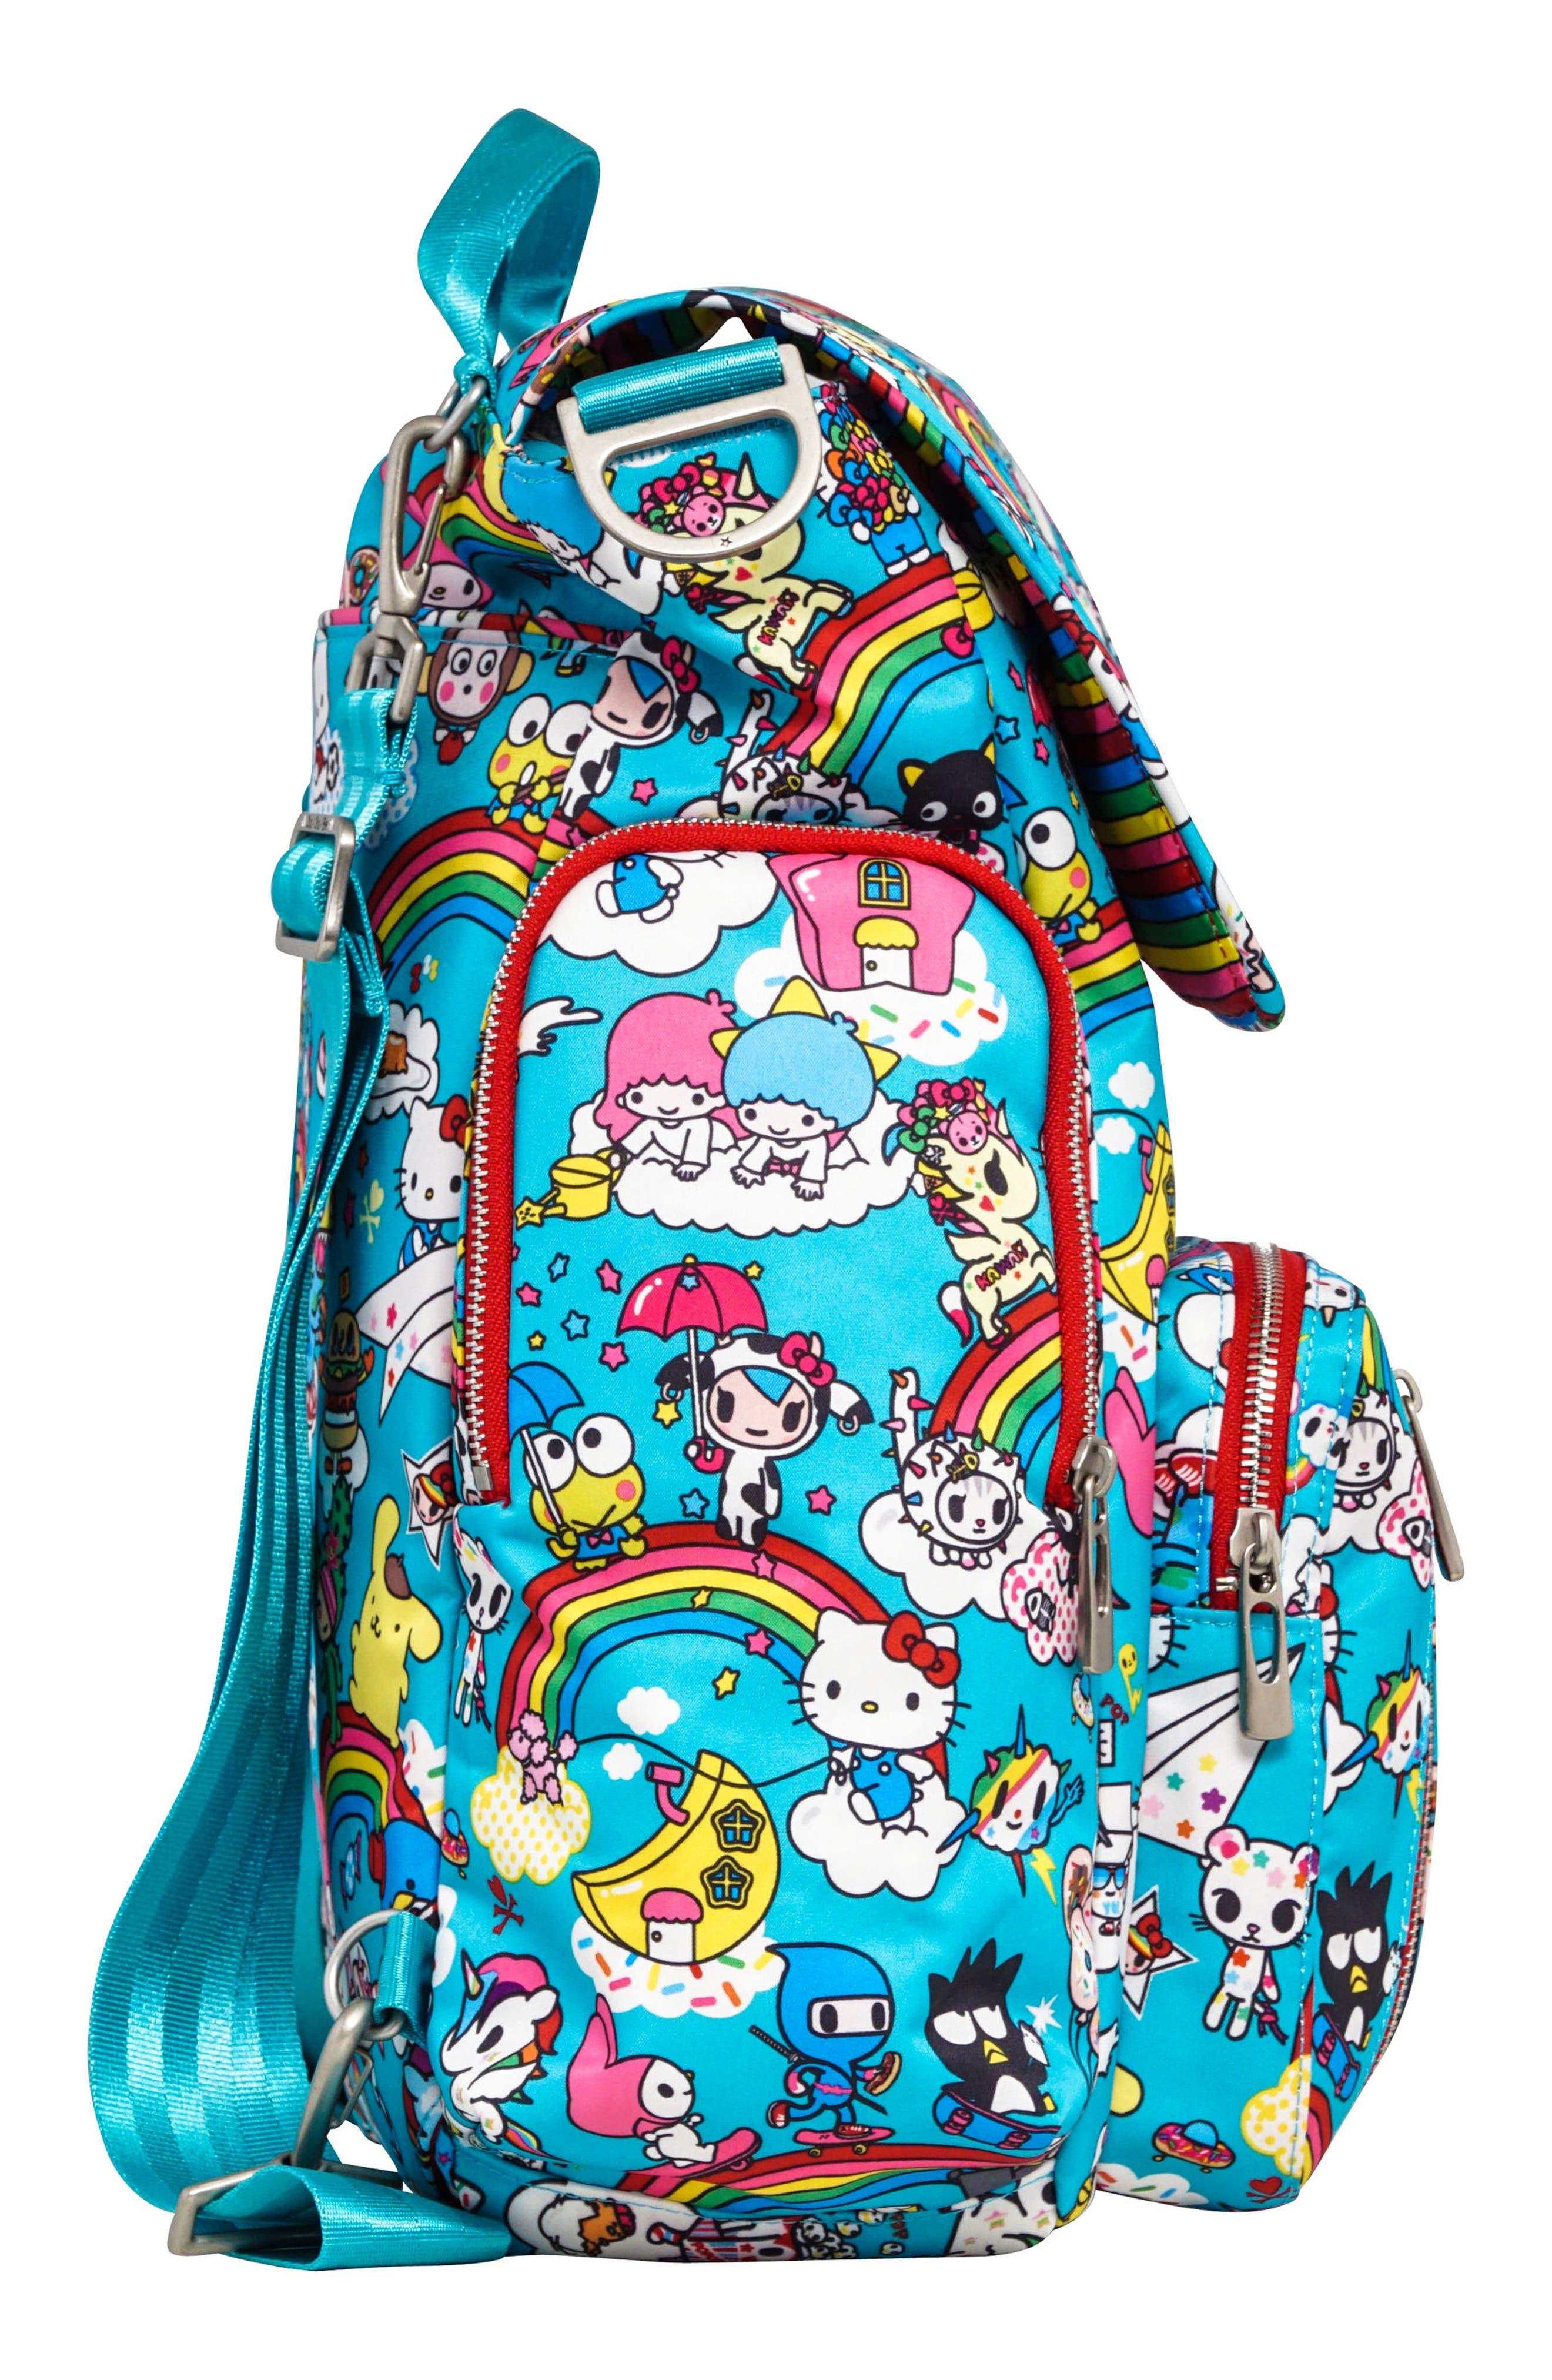 x tokidoki for Hello Sanrio Rainbow Dreams Sporty Diaper Backpack,                             Alternate thumbnail 4, color,                             Rainbow Dreams